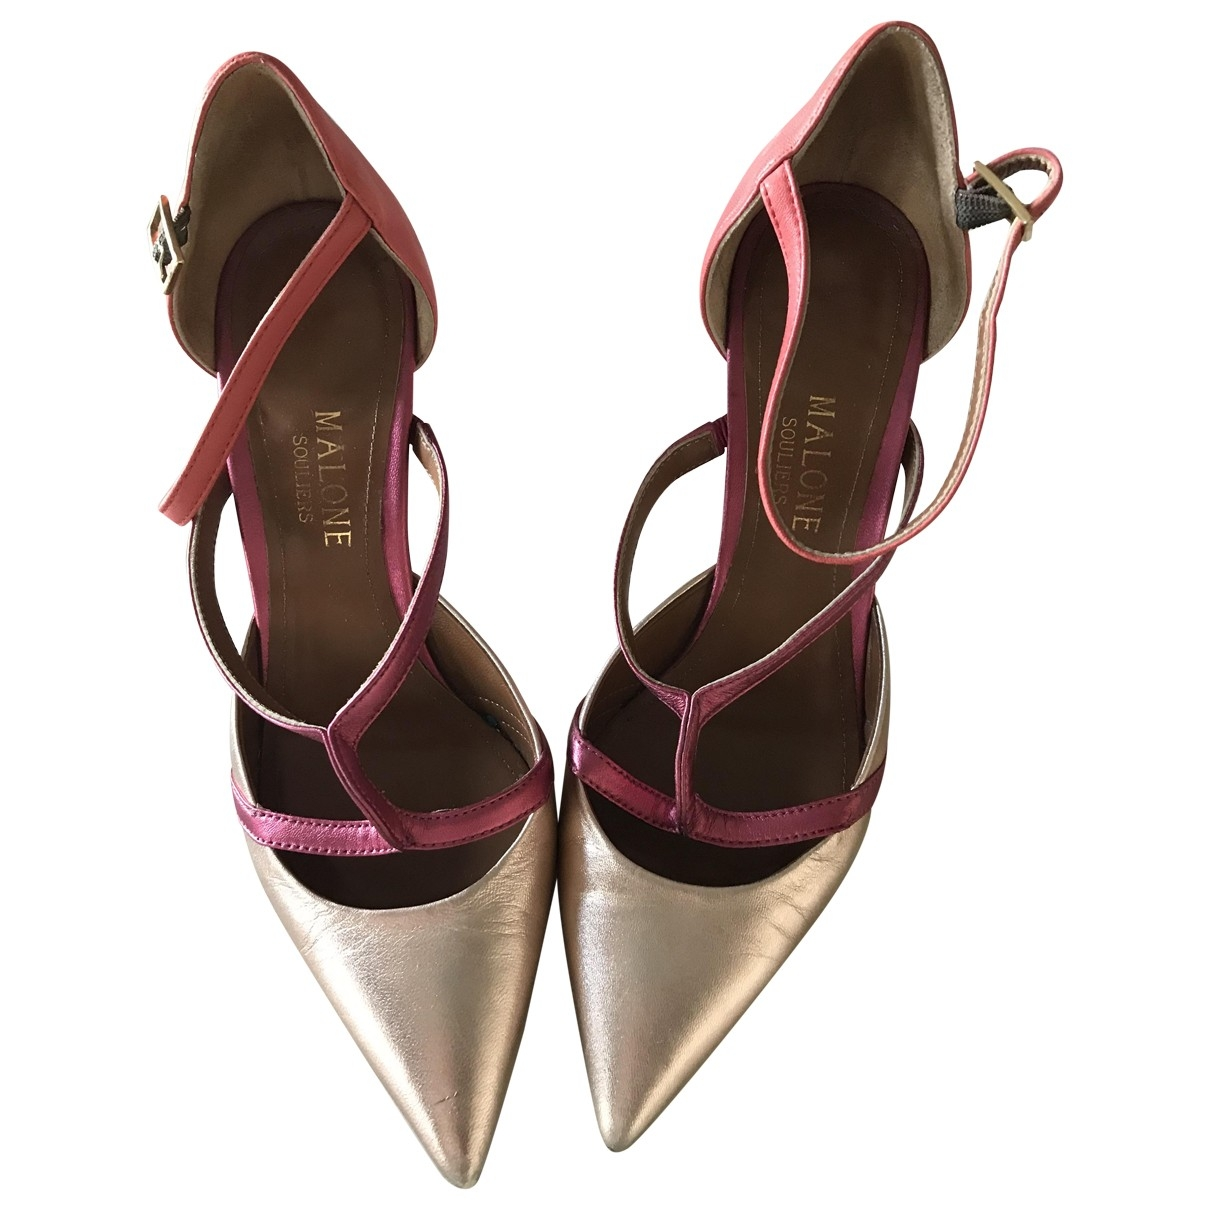 Malone Souliers \N Gold Leather Heels for Women 37.5 EU